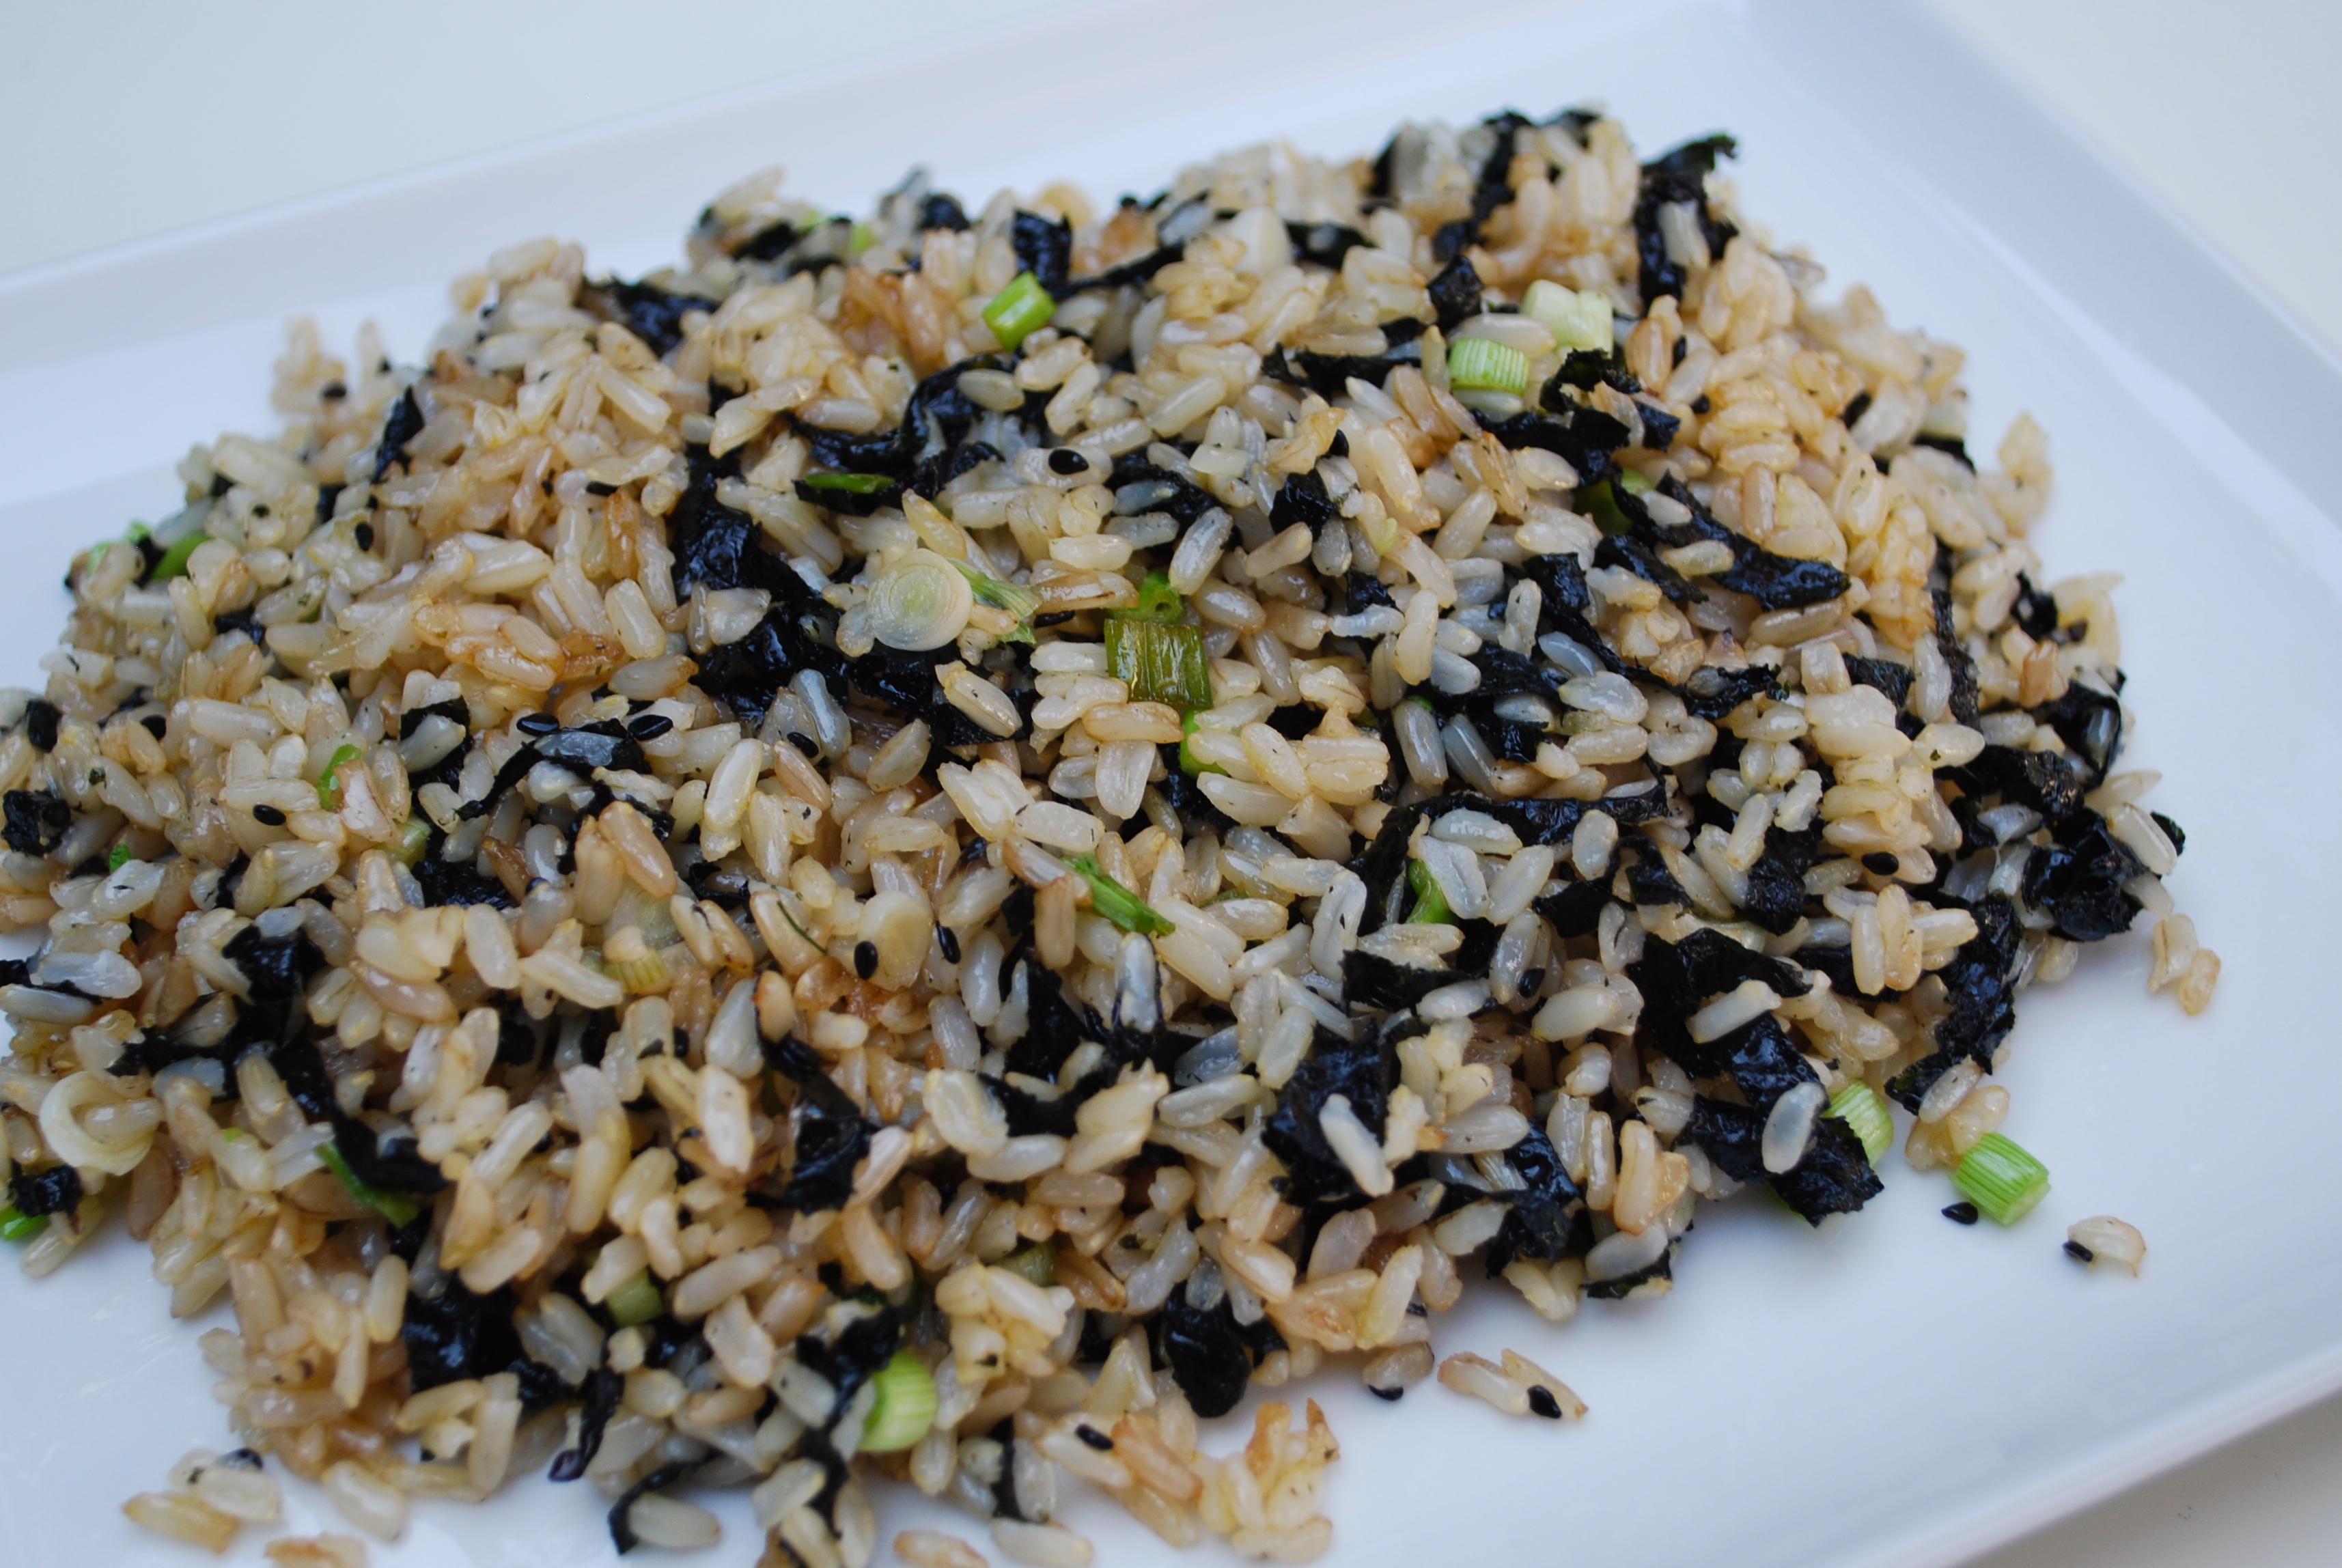 Stirfried Brown Rice With Seaweed & Black Sesame